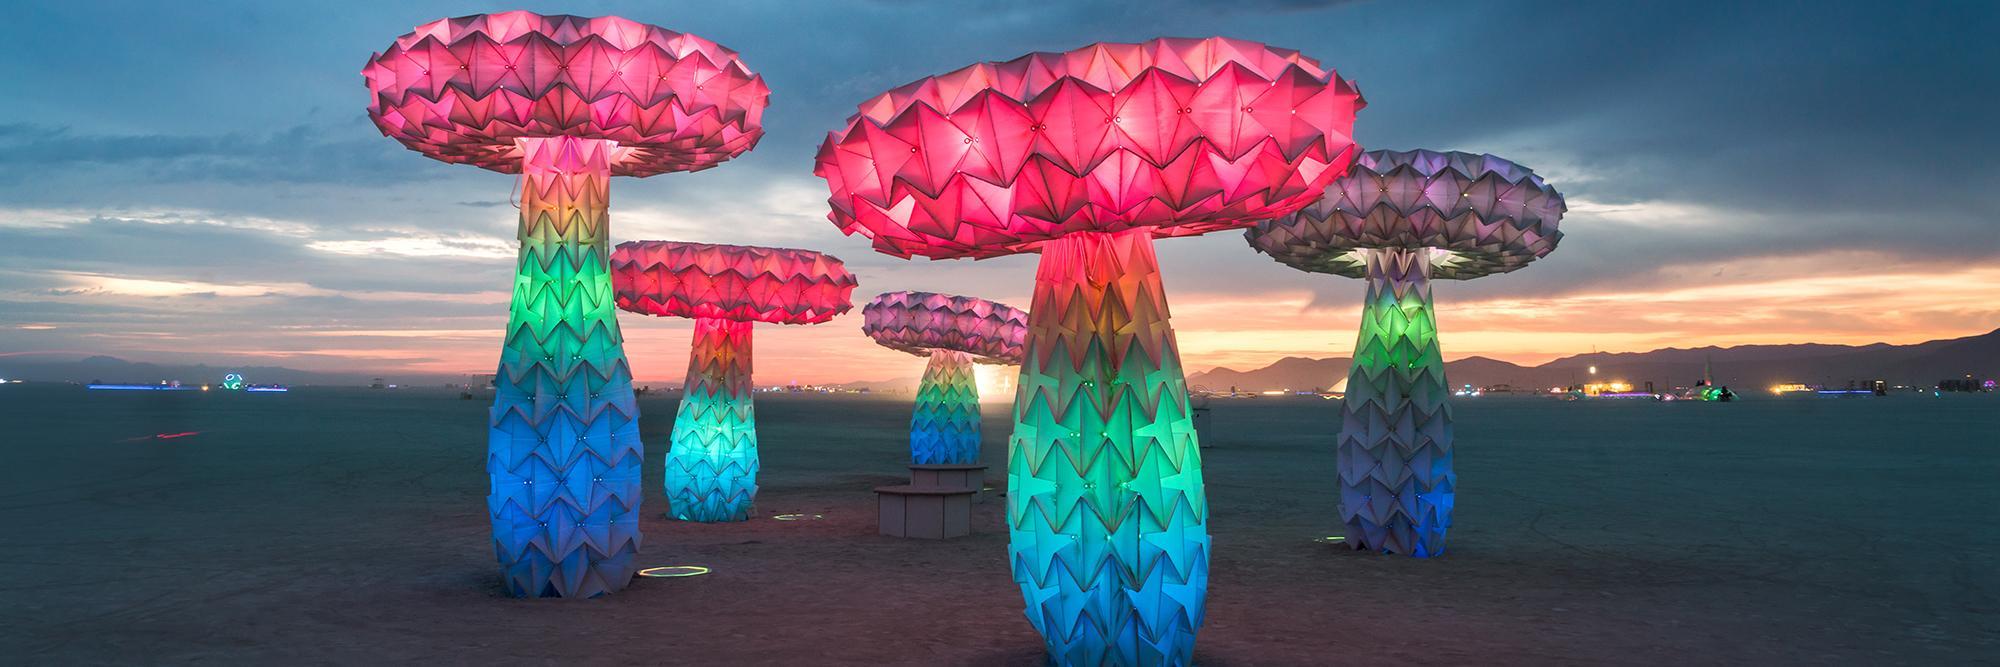 Renwick Burning Man.jpg